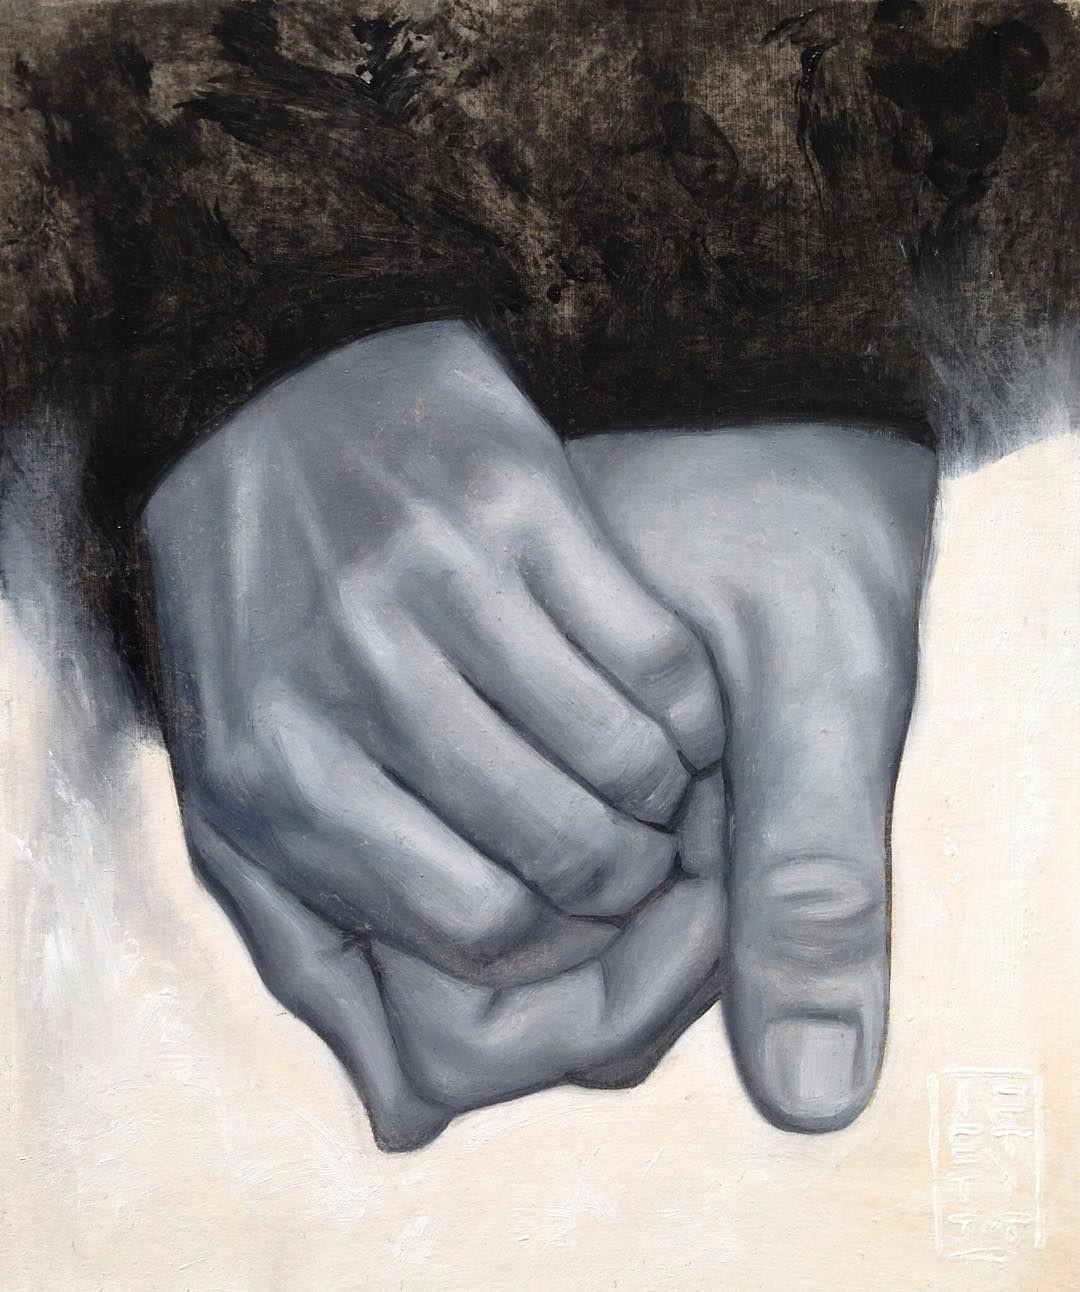 ian pettitt on instagram alcyone buy art for someone you love